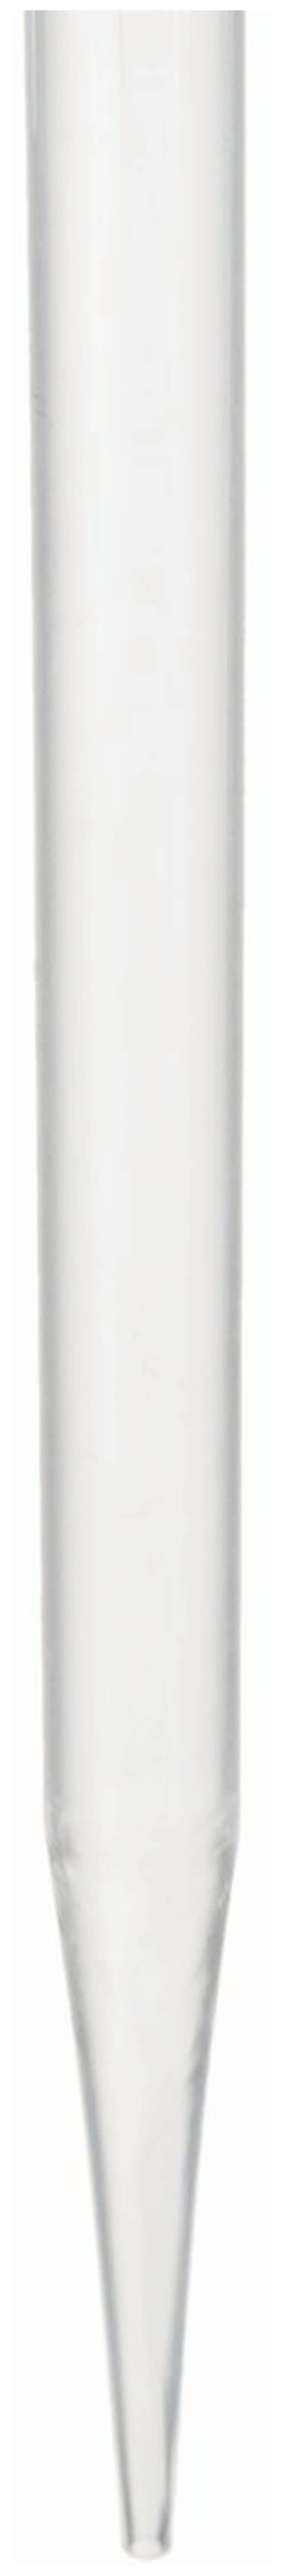 BrandTech BRANDPipet Tips, 0.5 to 5mL 500 to 5000μL tips; Bulk; 1 bag;